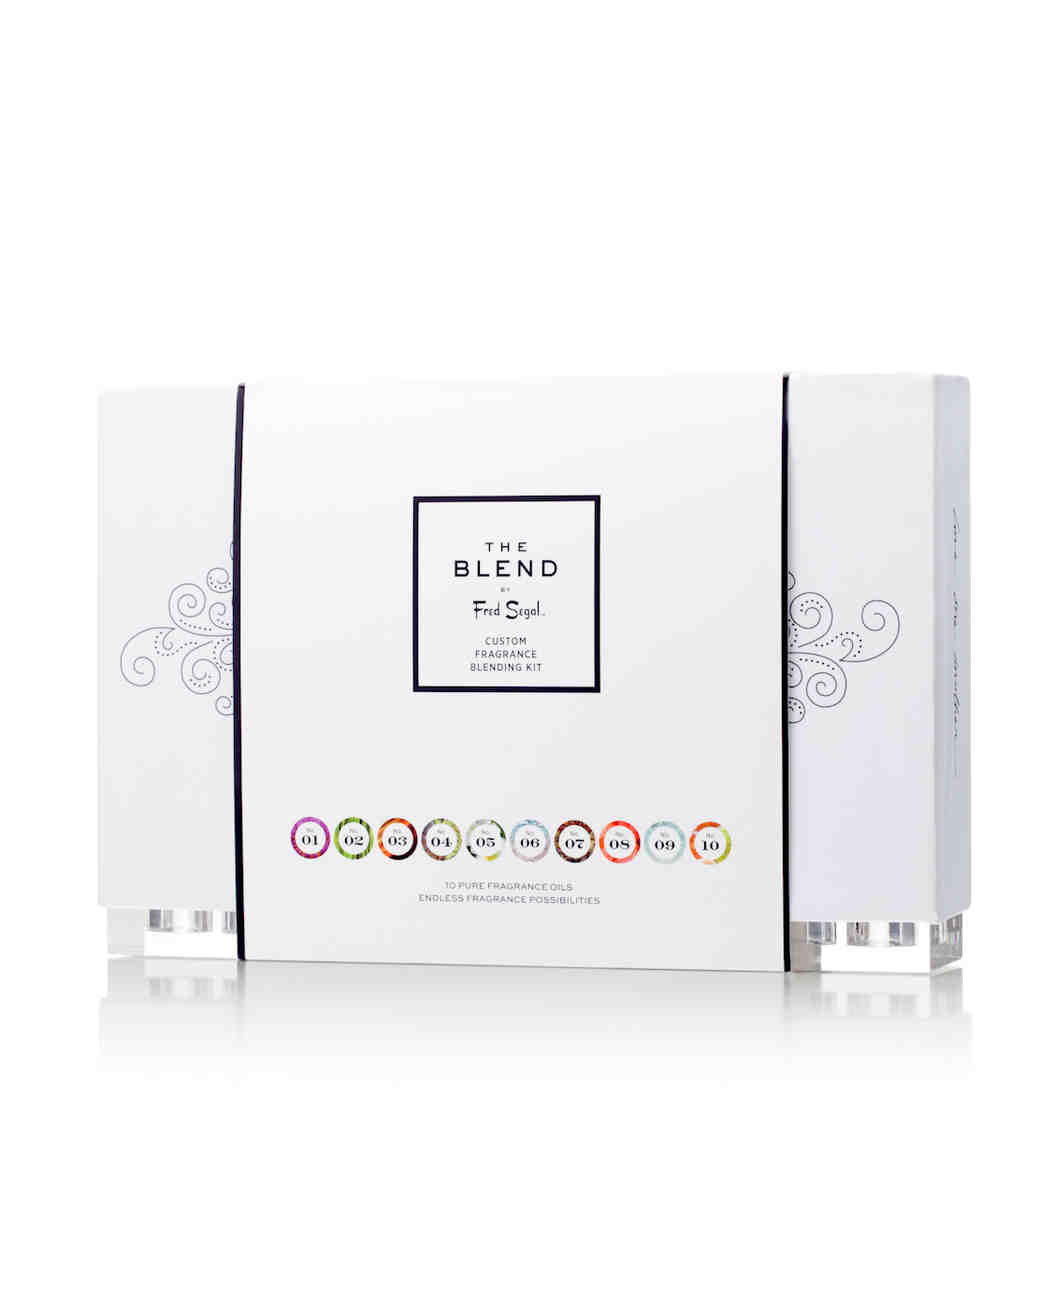 customize-beauty-fred-segal-the-blend-box-set-0415.jpg